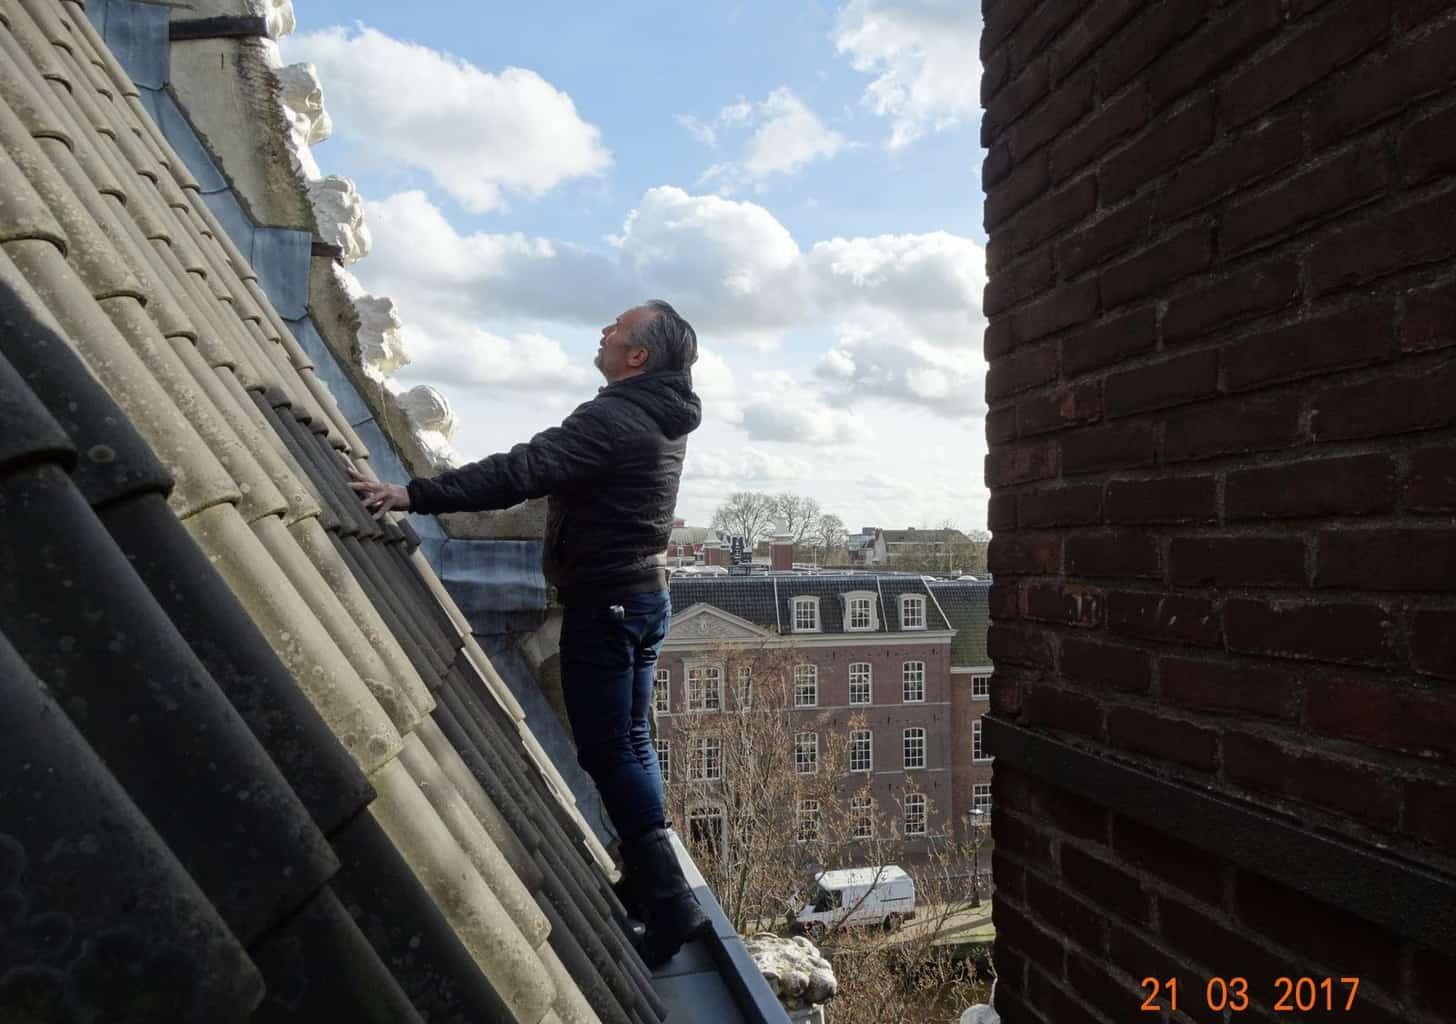 bouwkundige keuring Huis ter heide (6)